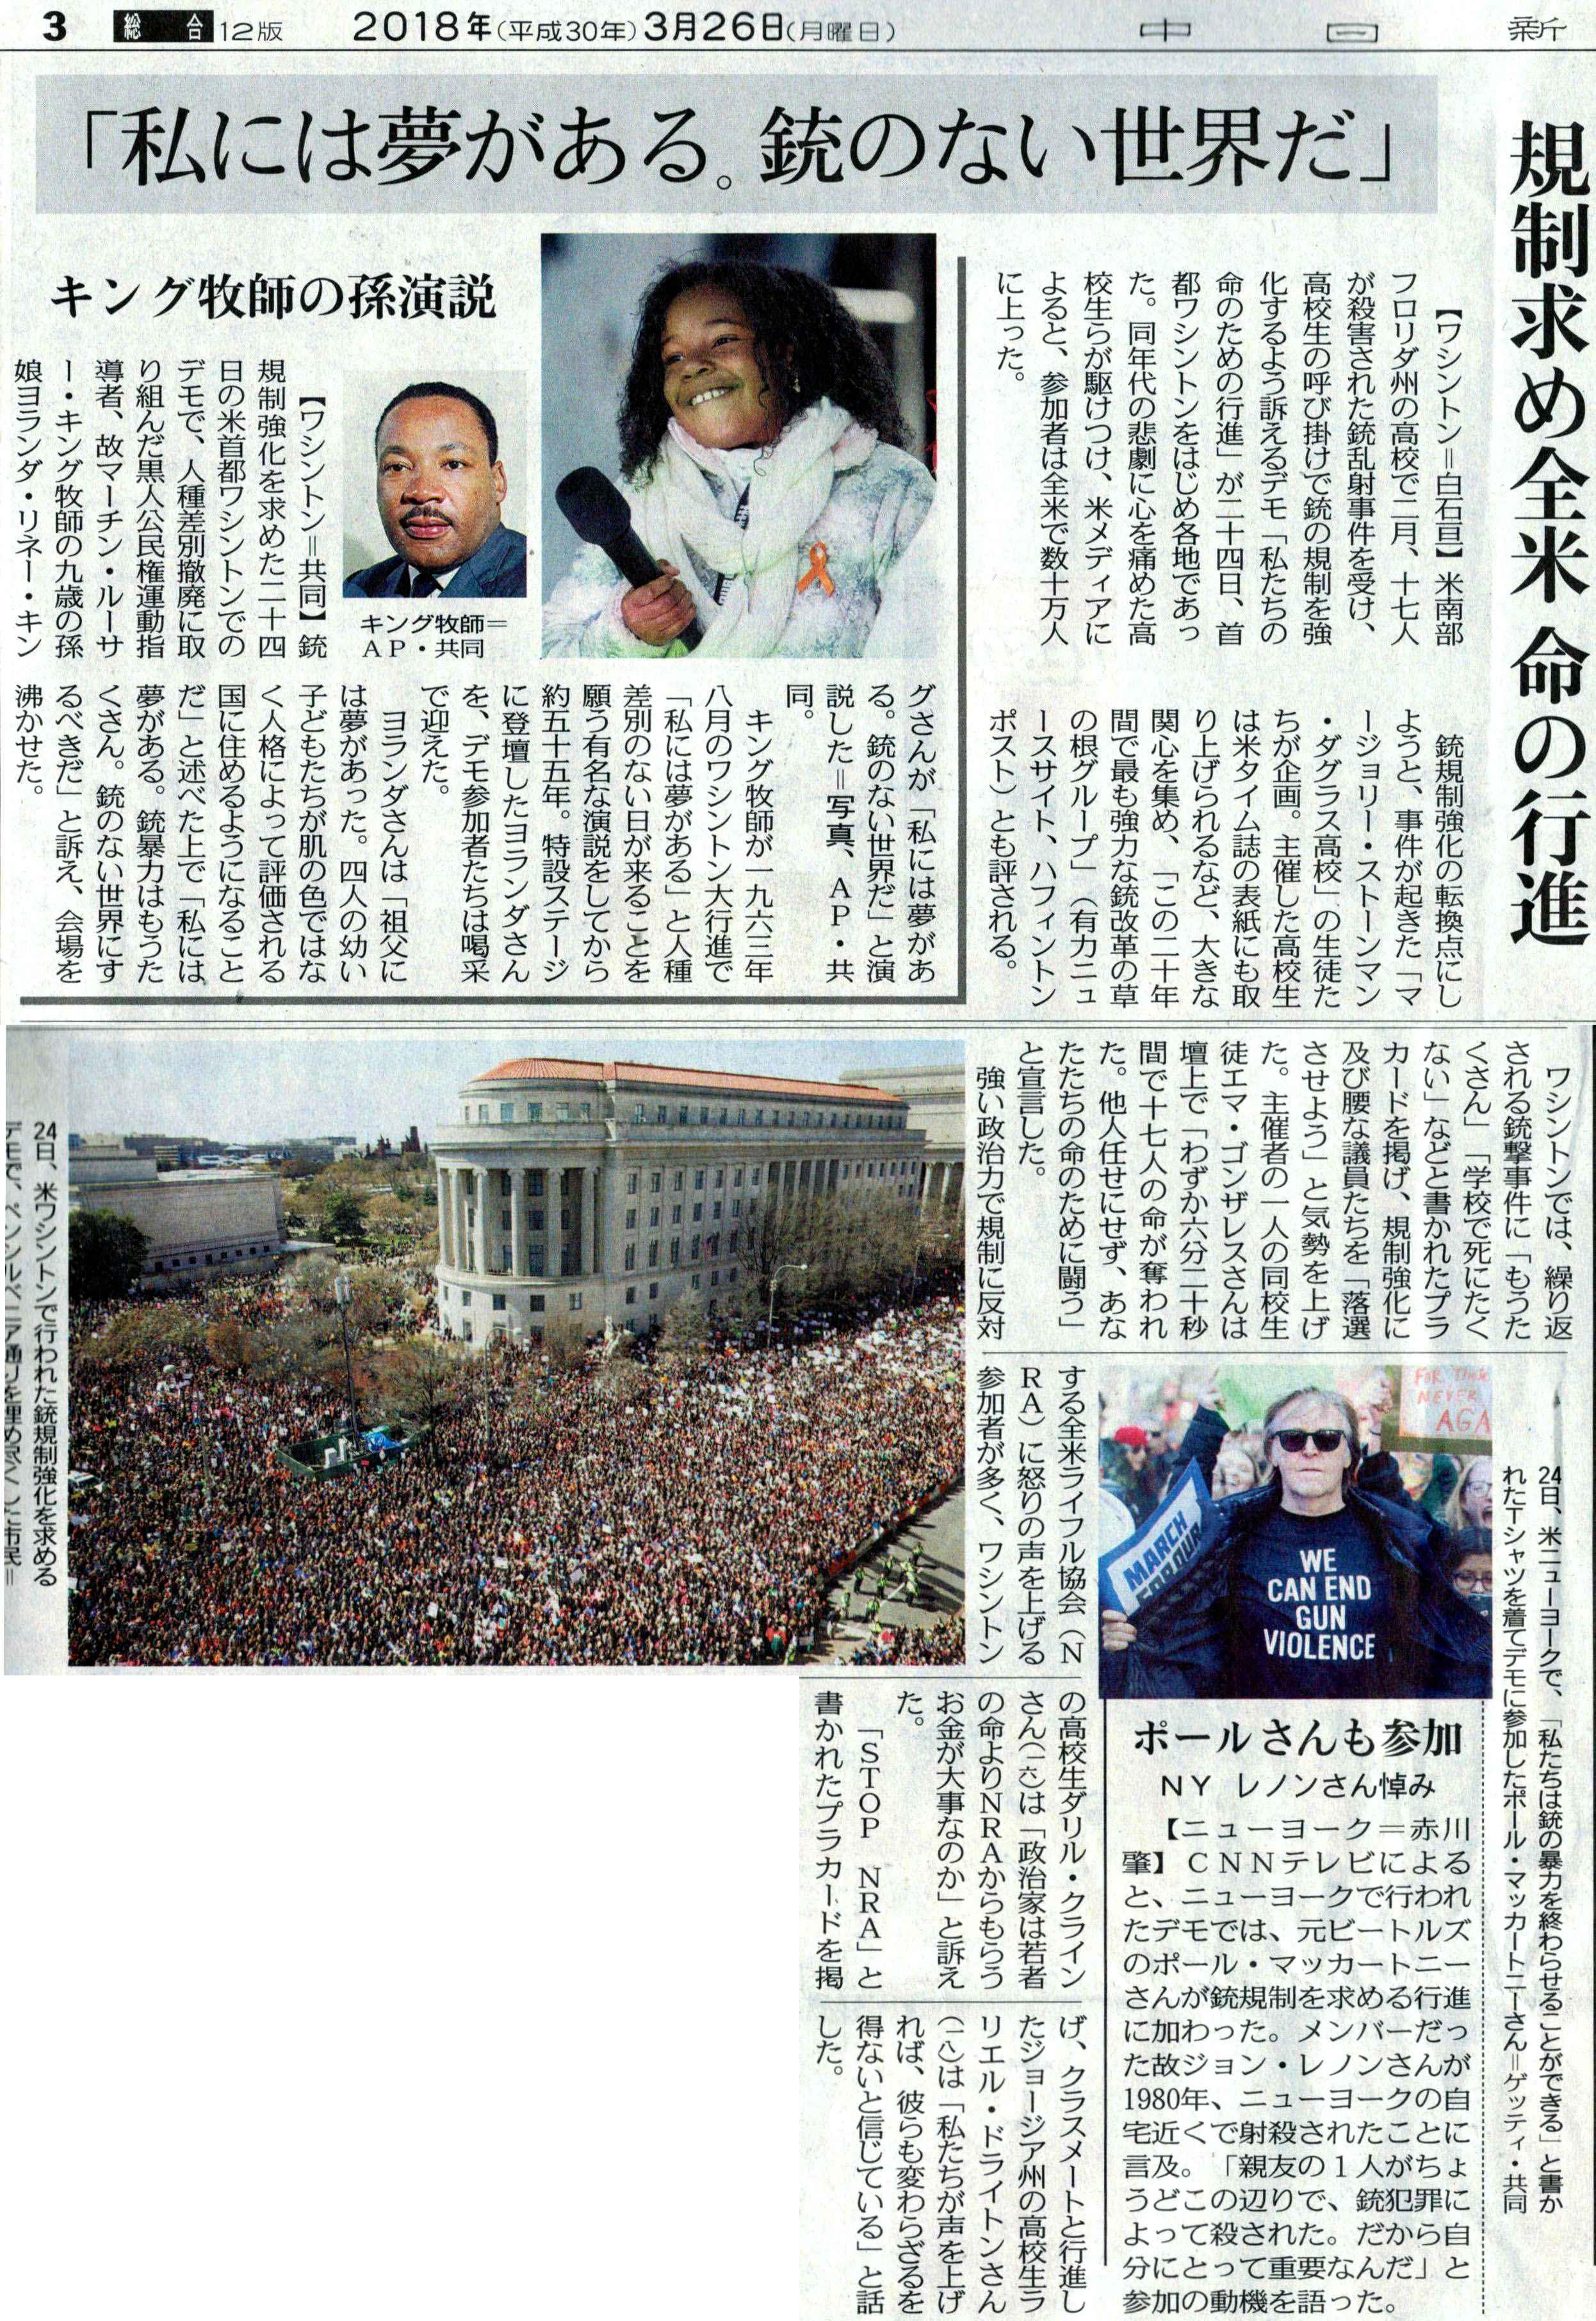 https://img.atwikiimg.com/www45.atwiki.jp/jippensha/attach/93/7316/15_jyuukisei.jpg